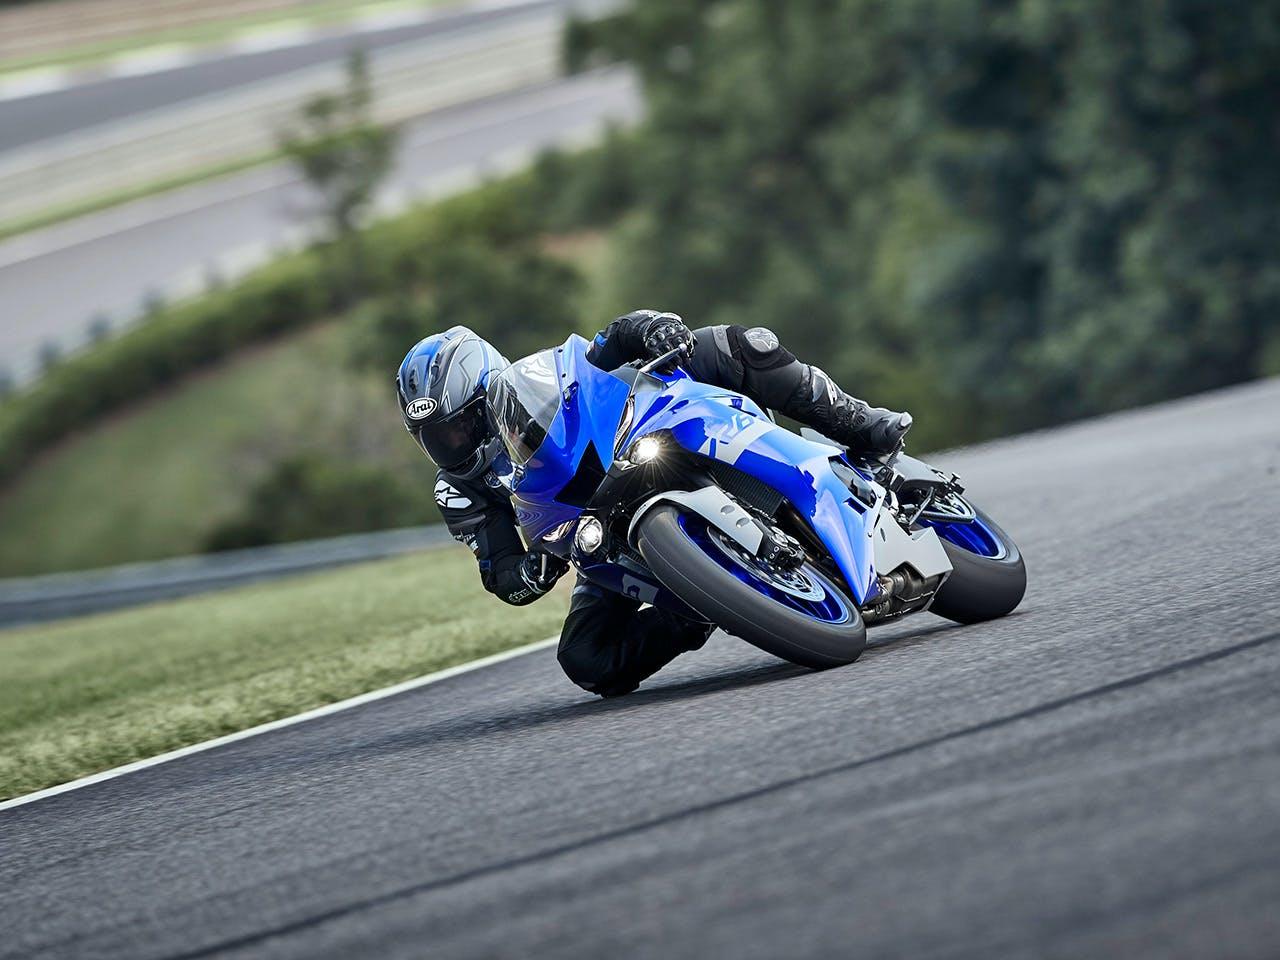 YAMAHA YZF-R6 in Yamaha Blue colour on the road